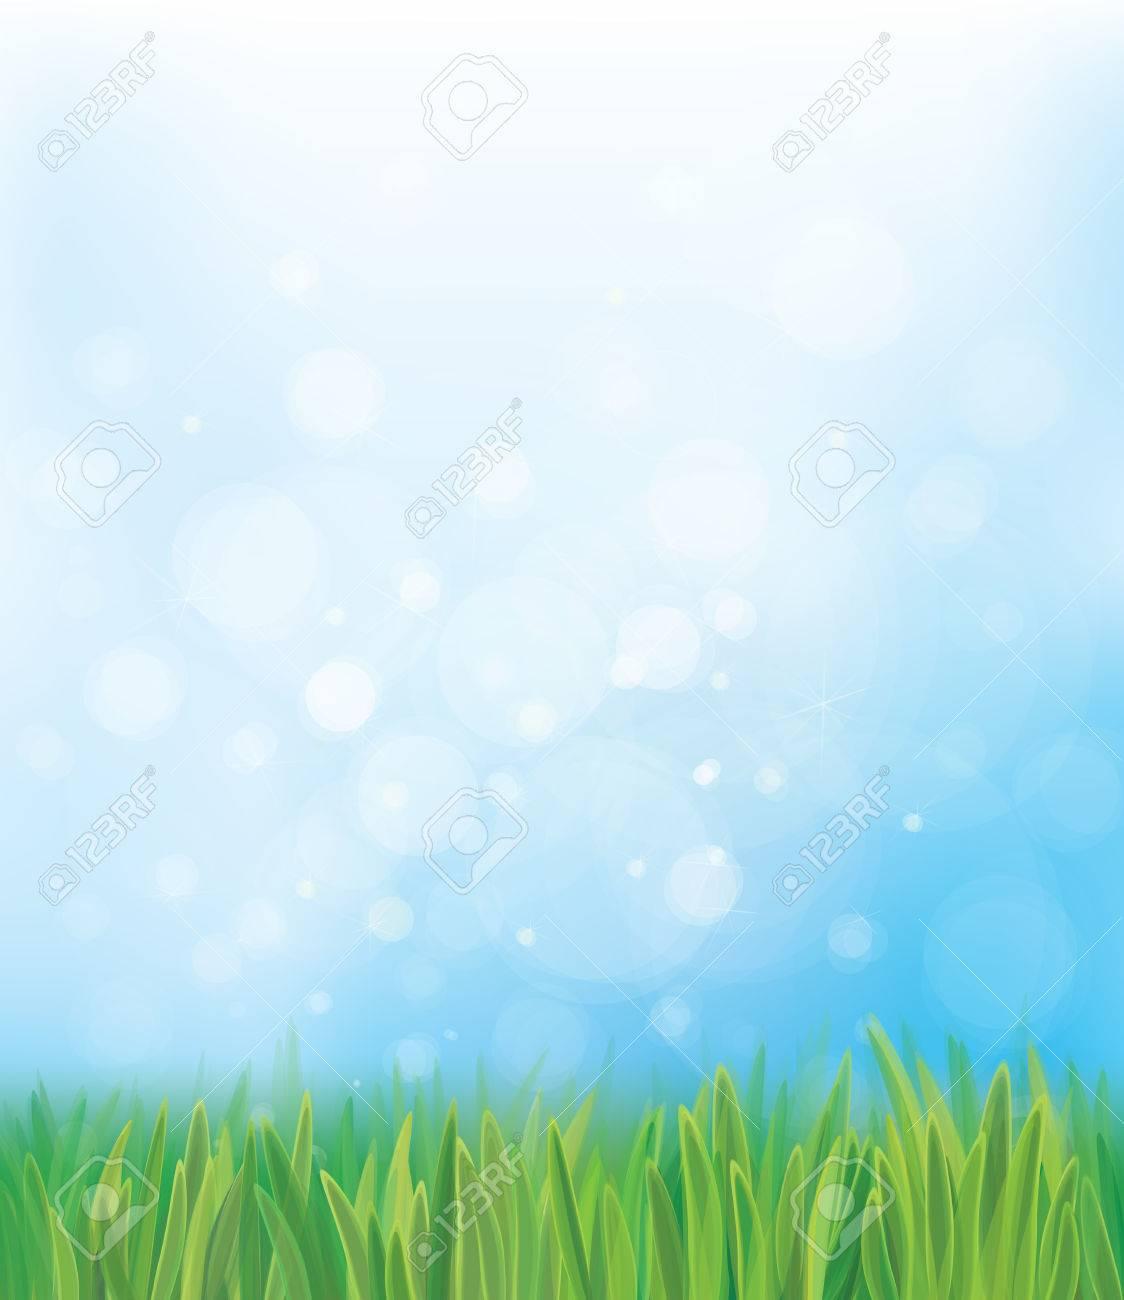 Download 7300 Background Blue Nature HD Paling Keren